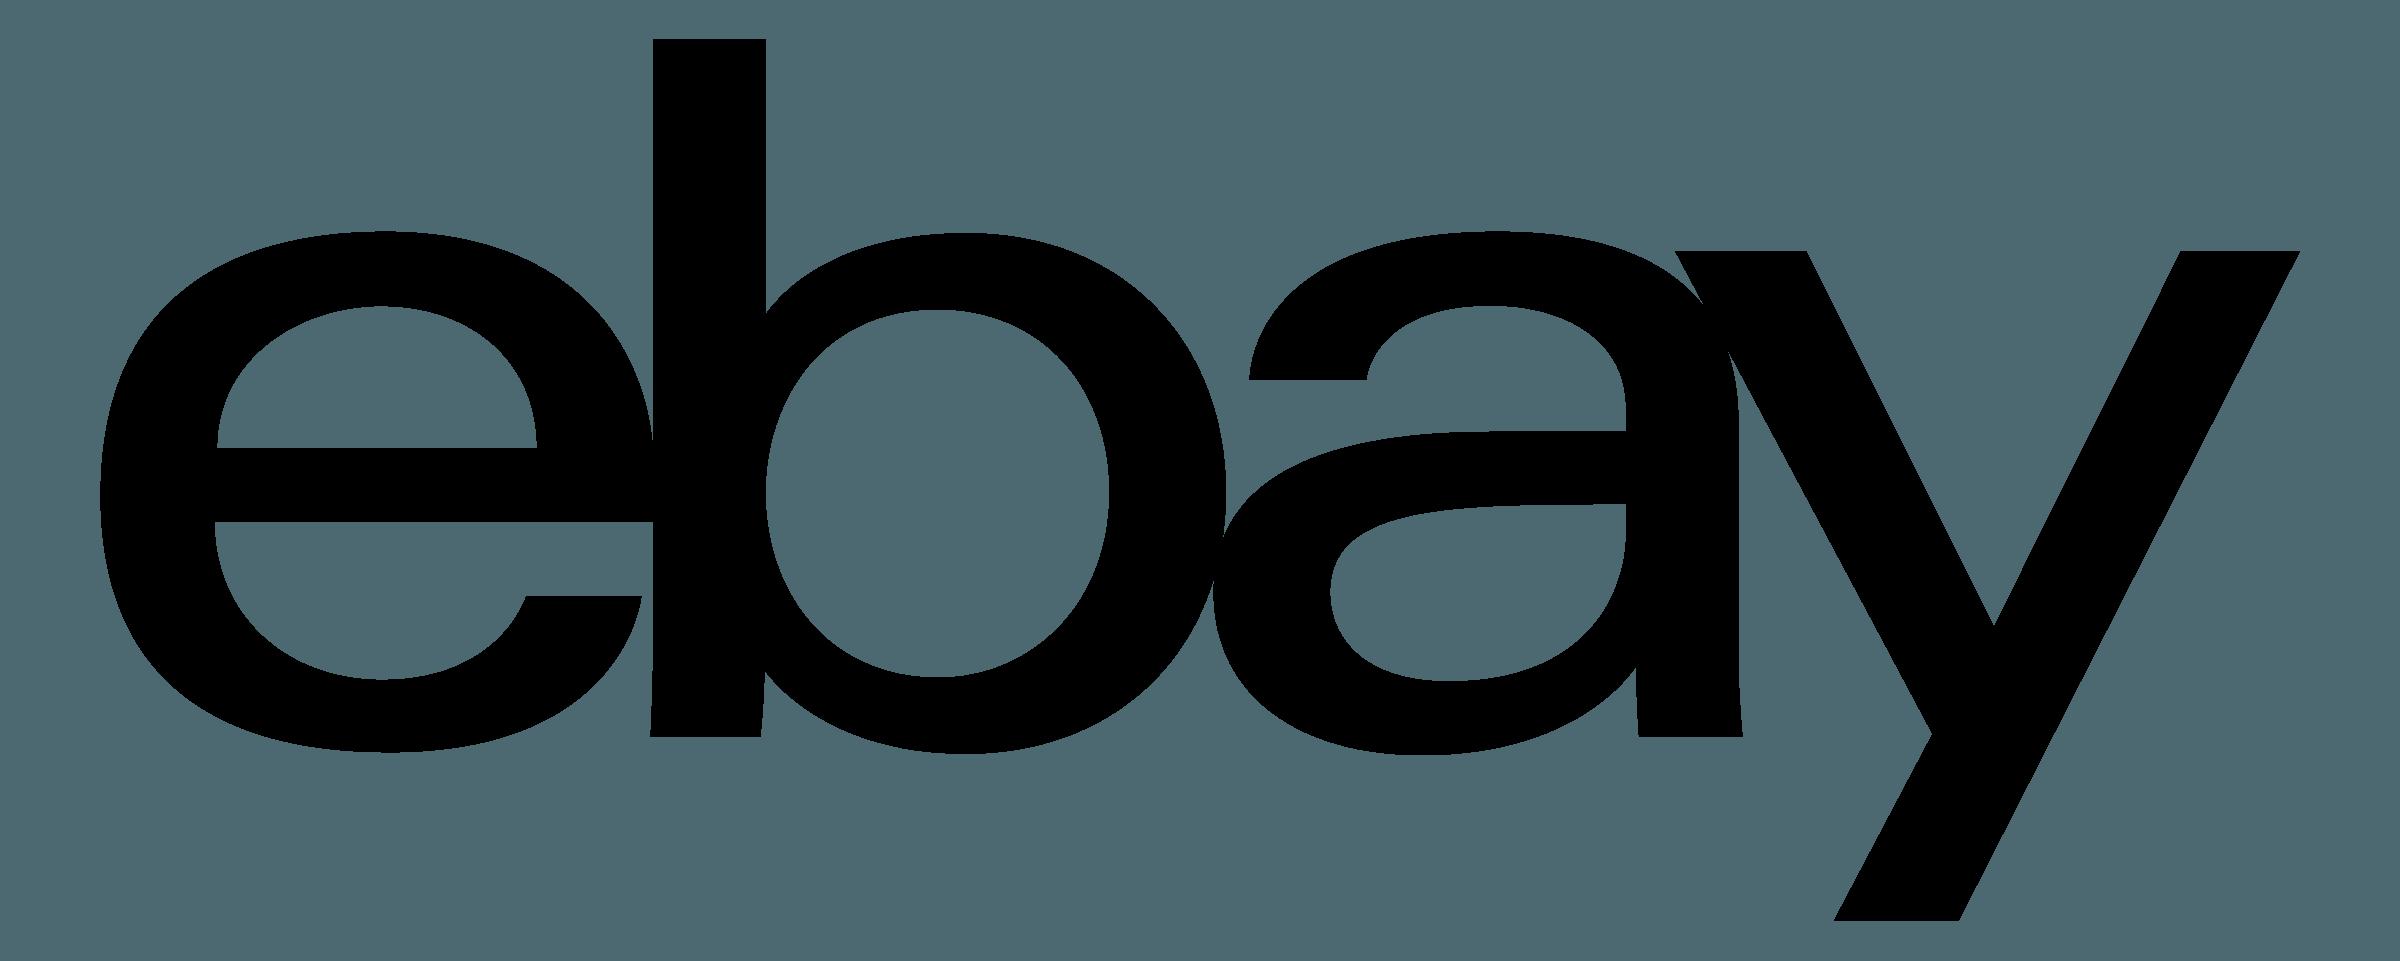 eBay Logo Black - Ebay Logo Vector PNG